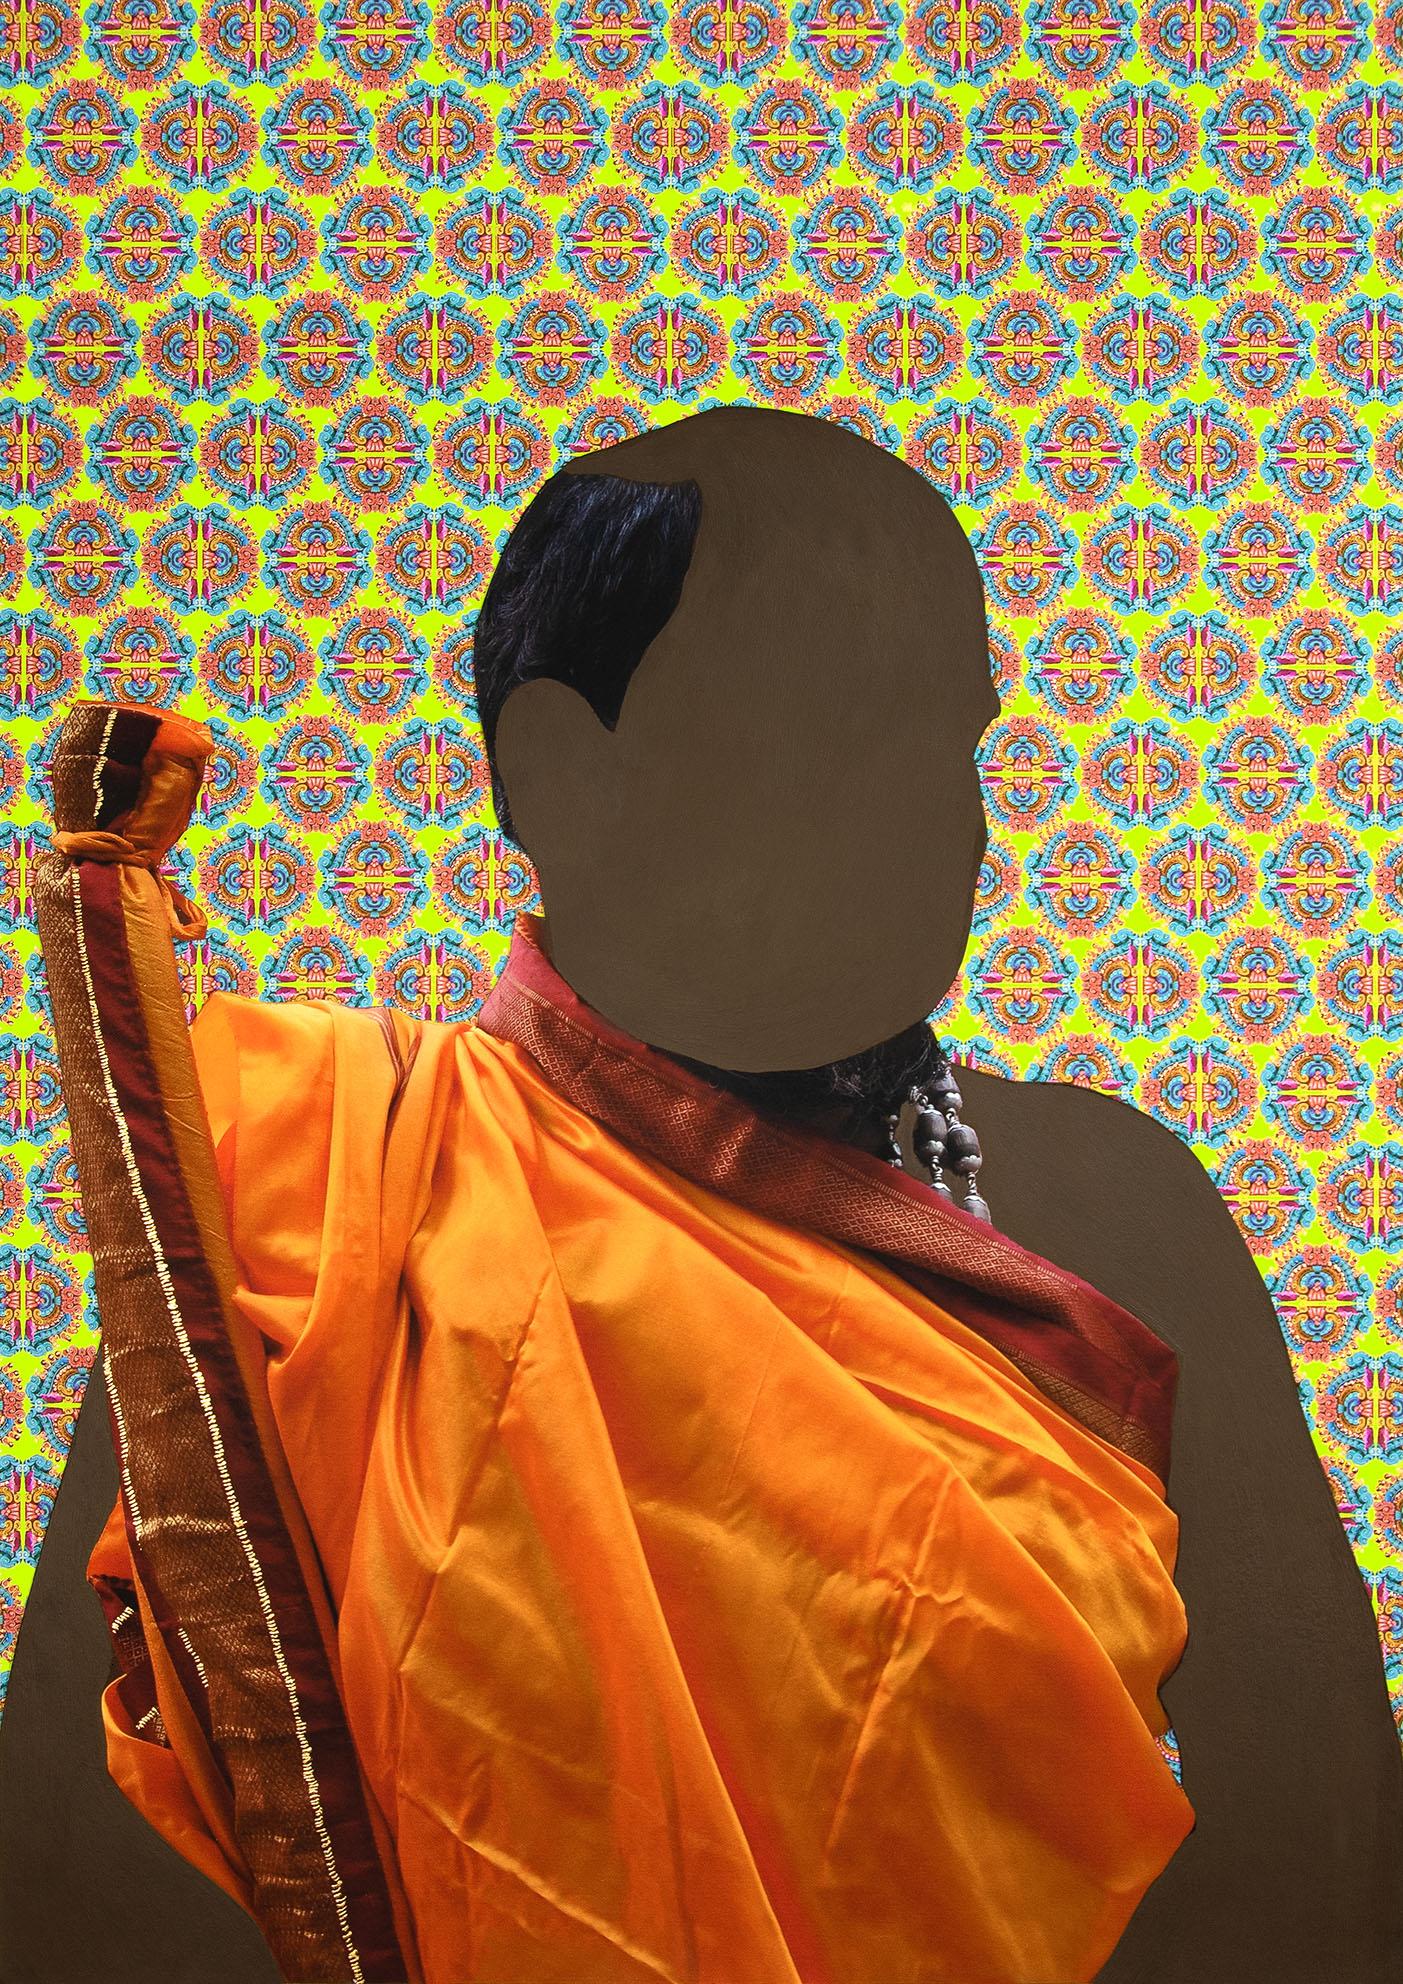 Portraits Edit Final_Swami shri.jpg